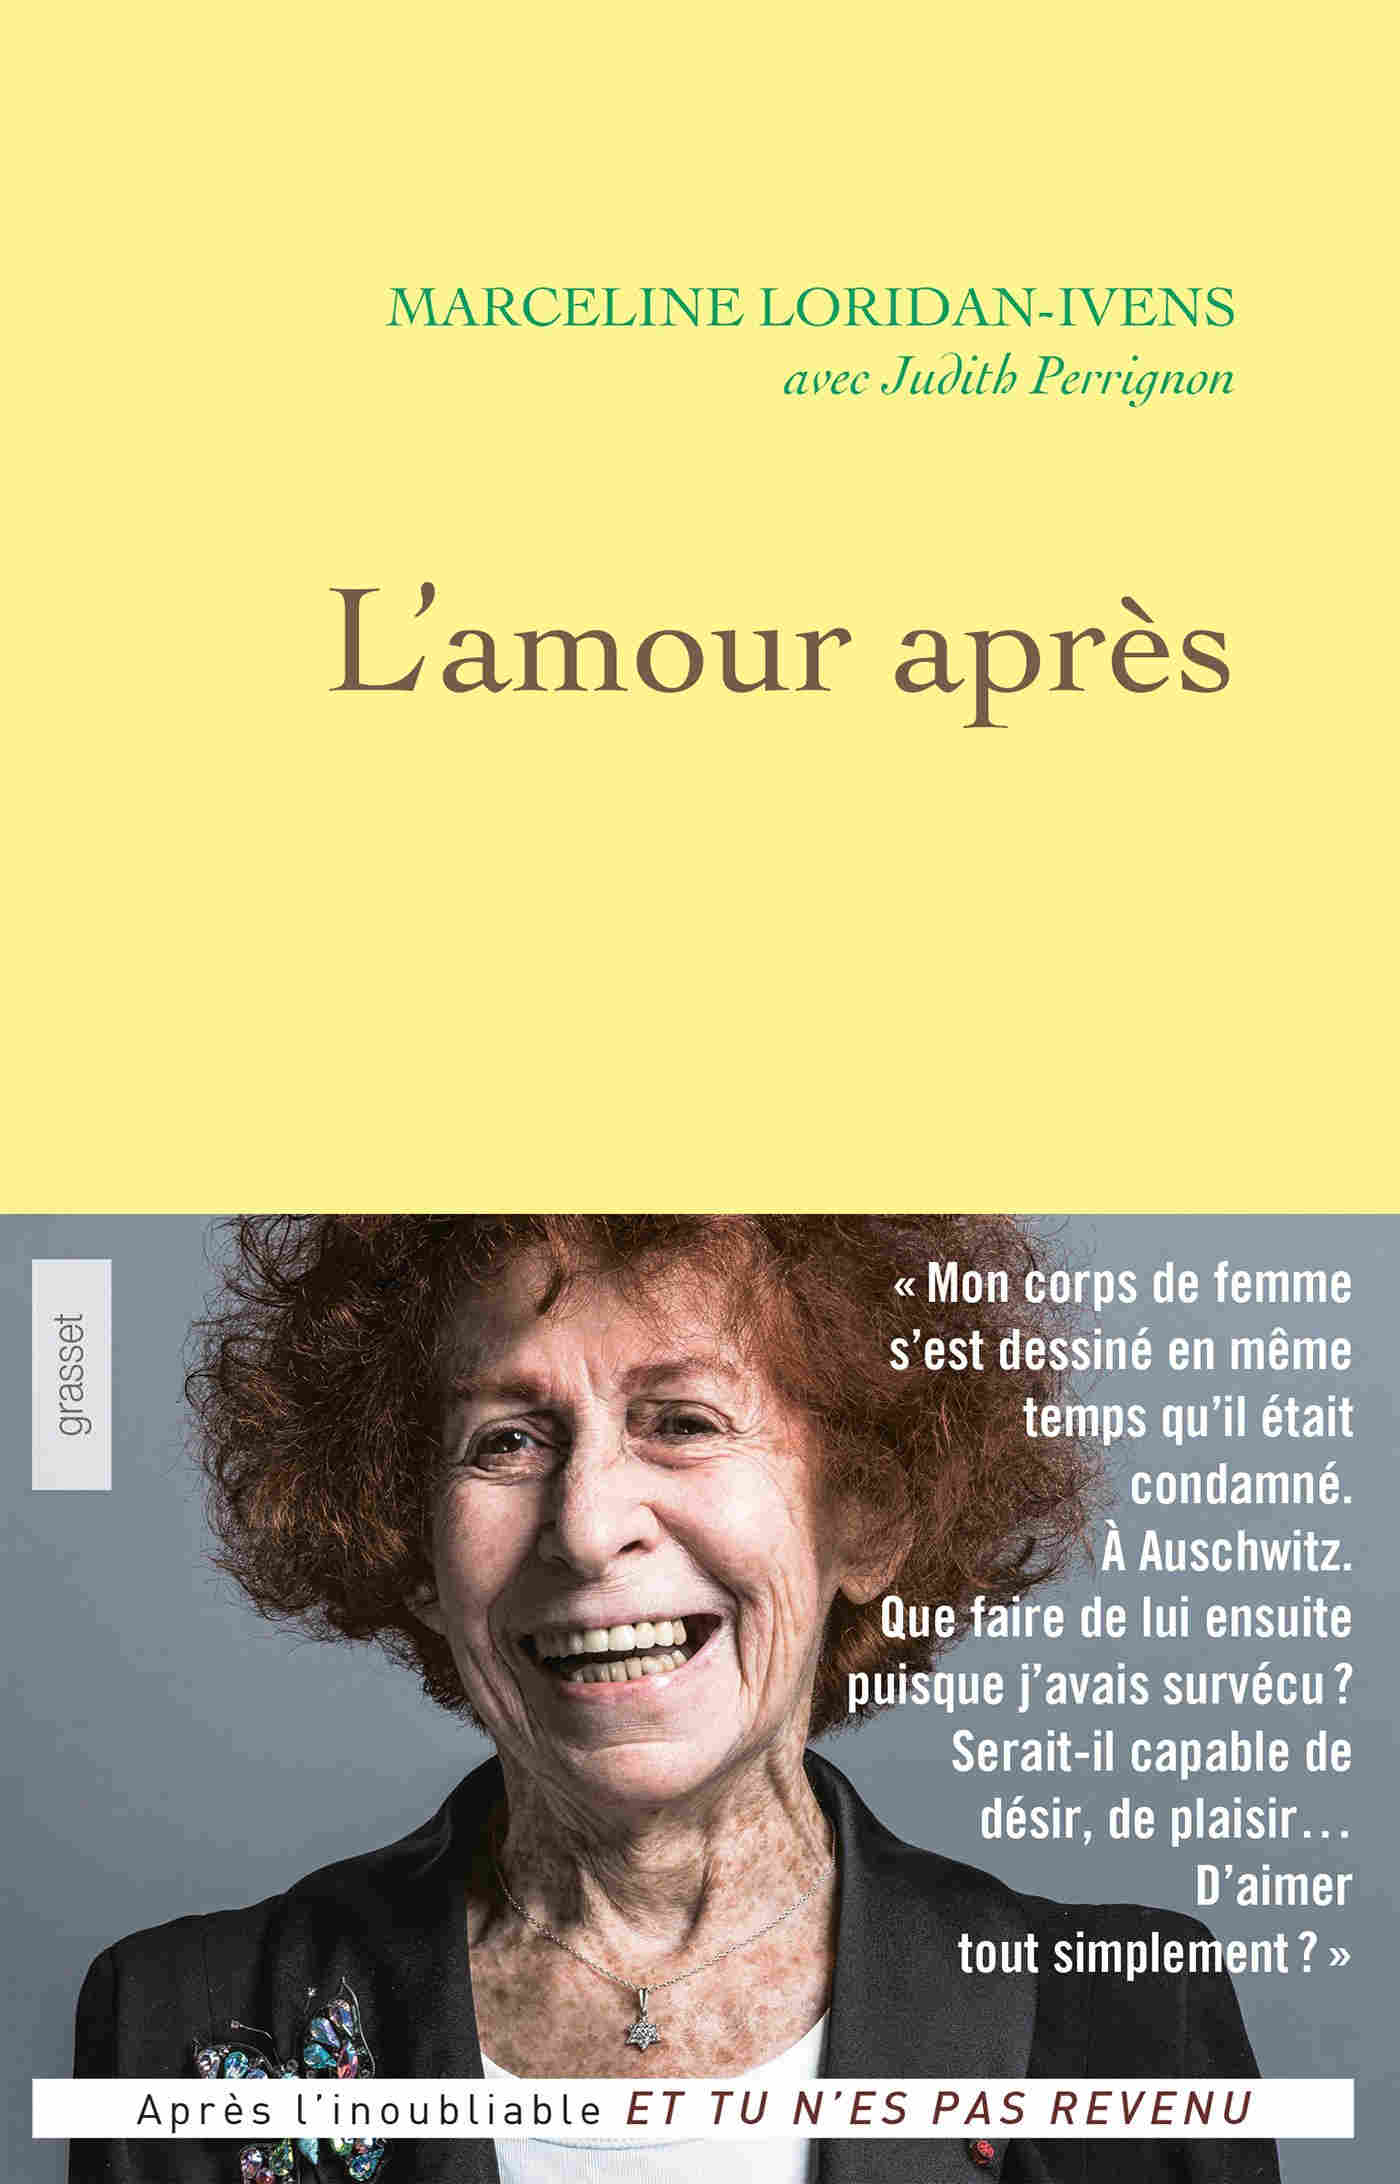 Marceline Loridan-Iven L'amour après Jewpop